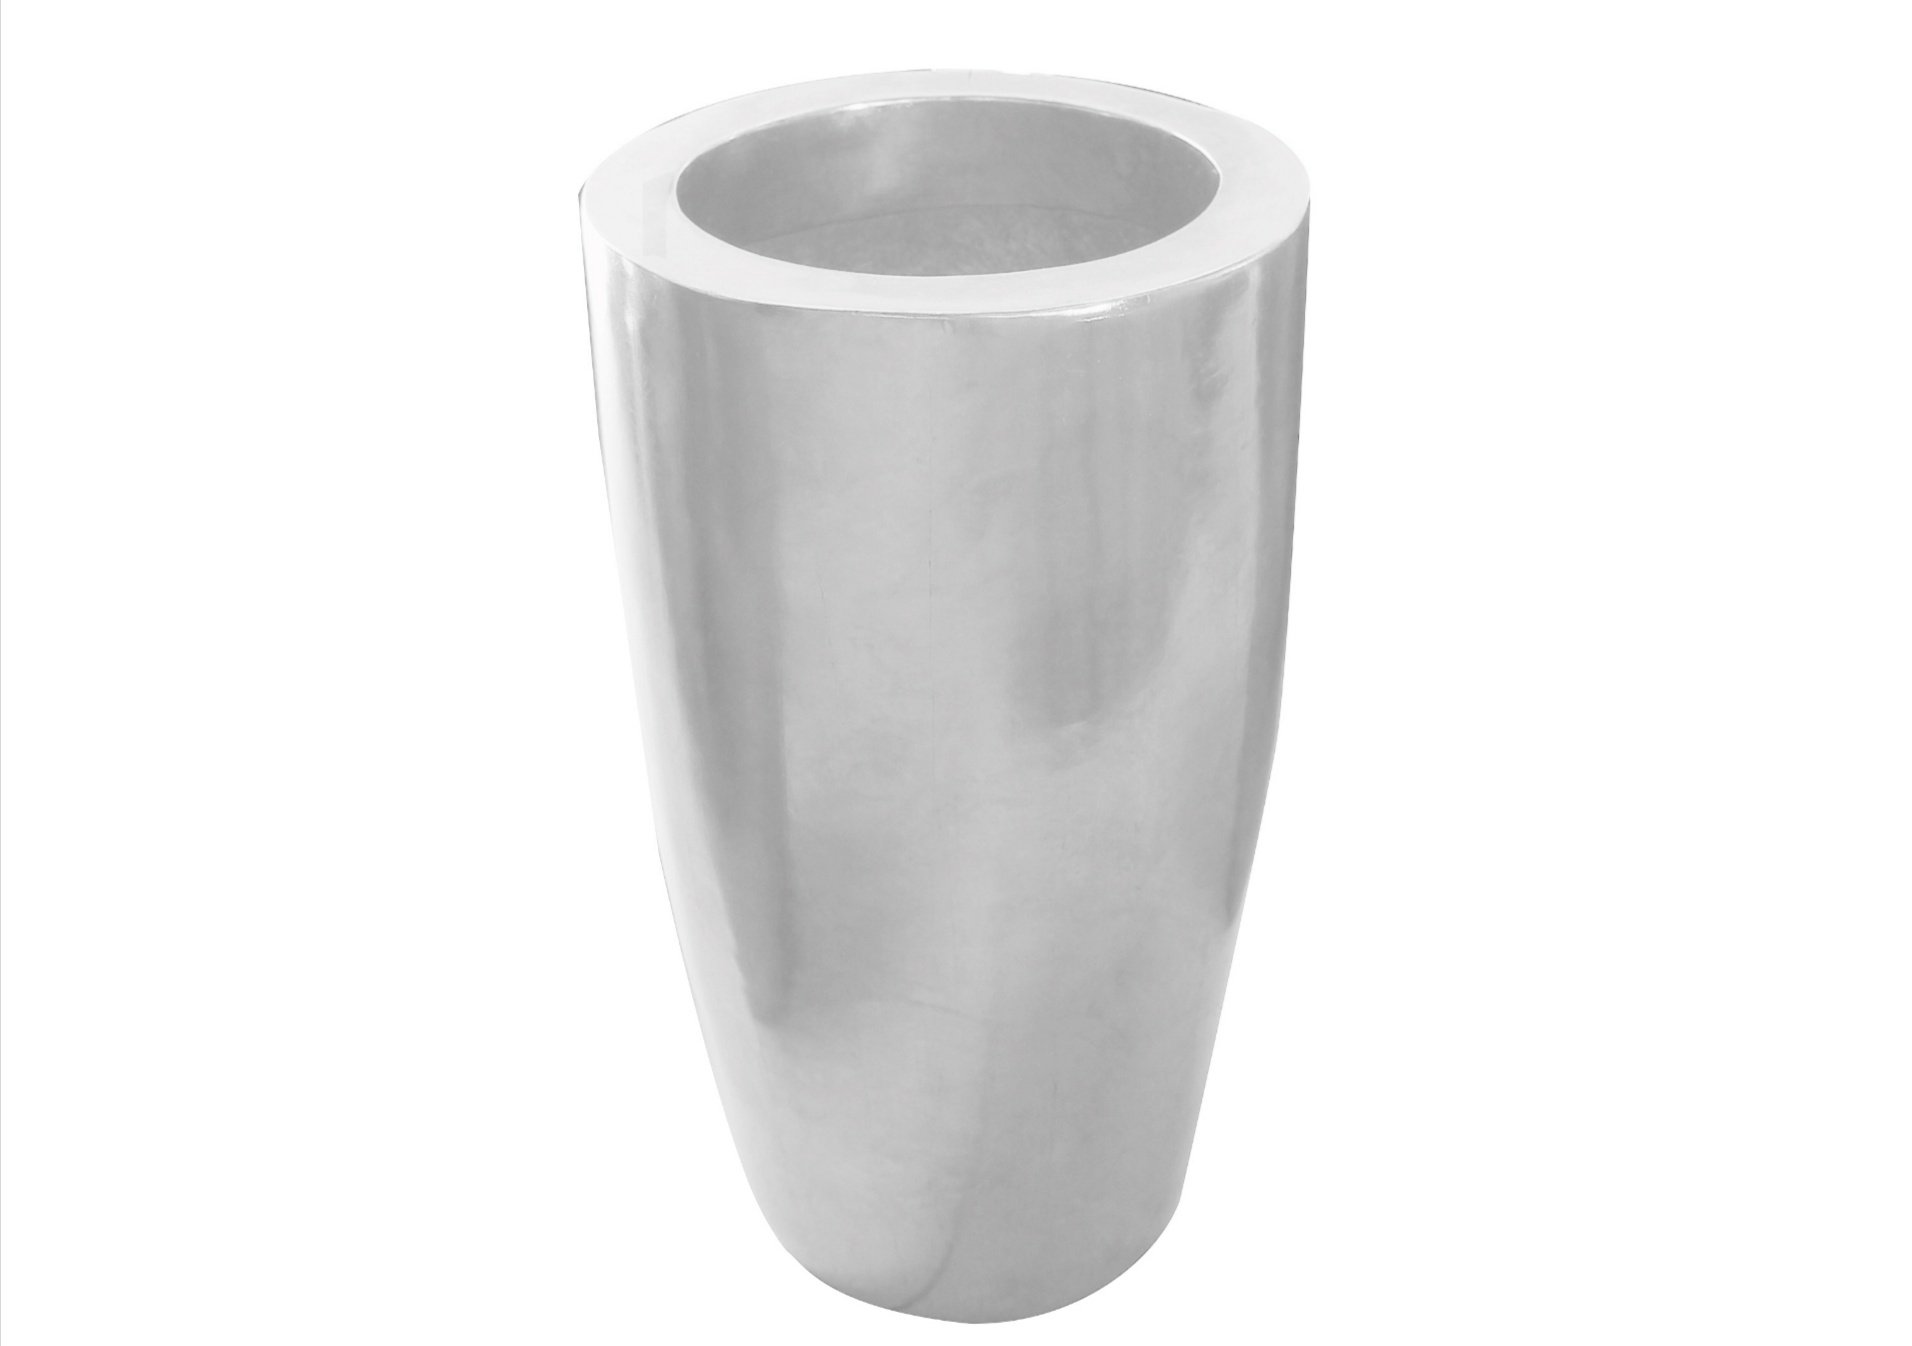 VENICE PLATER-DUCO WHITE